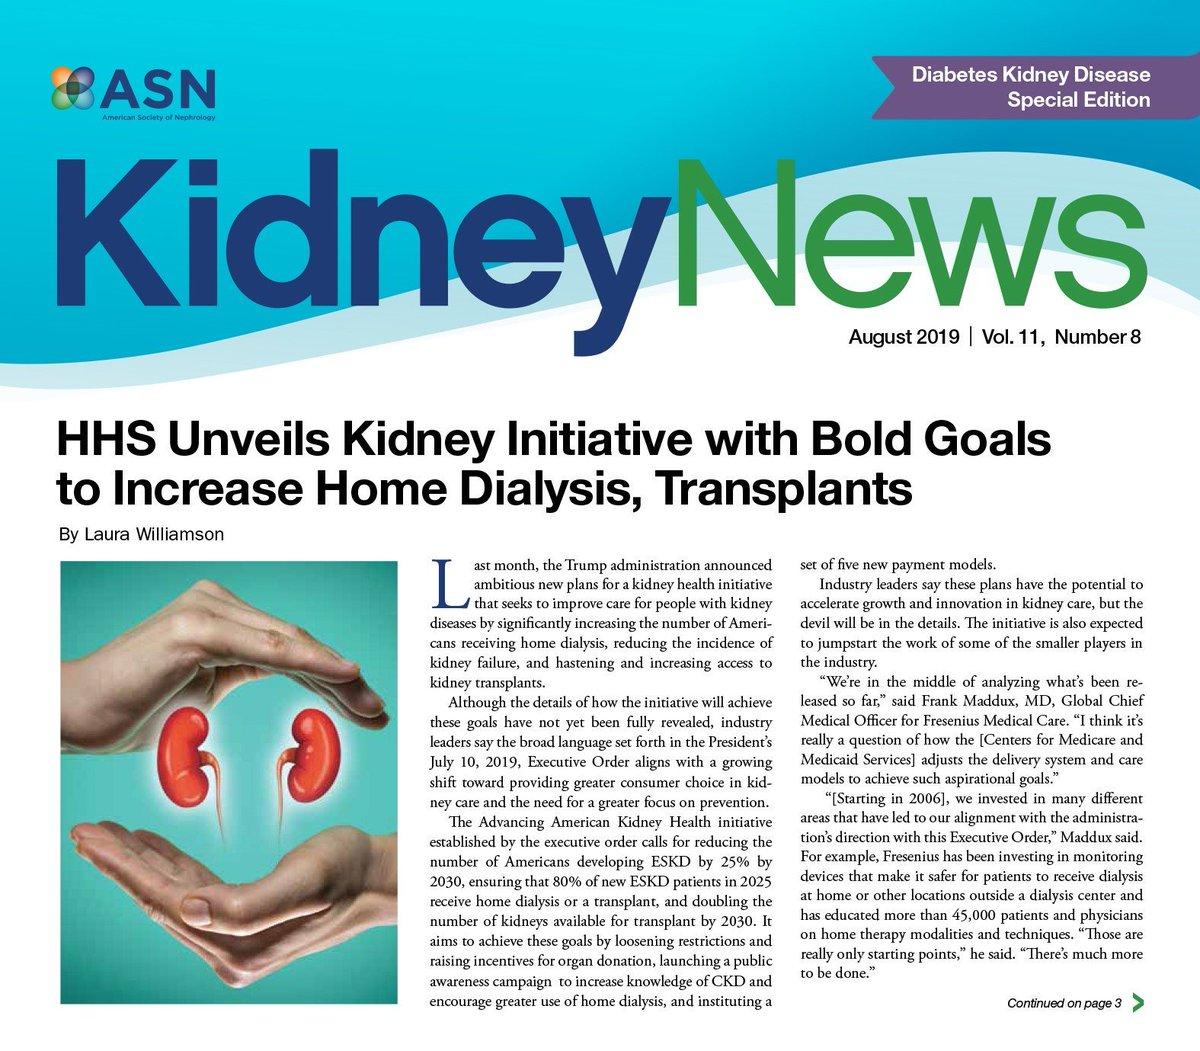 ASN Kidney News (@KidneyNews) | Twitter